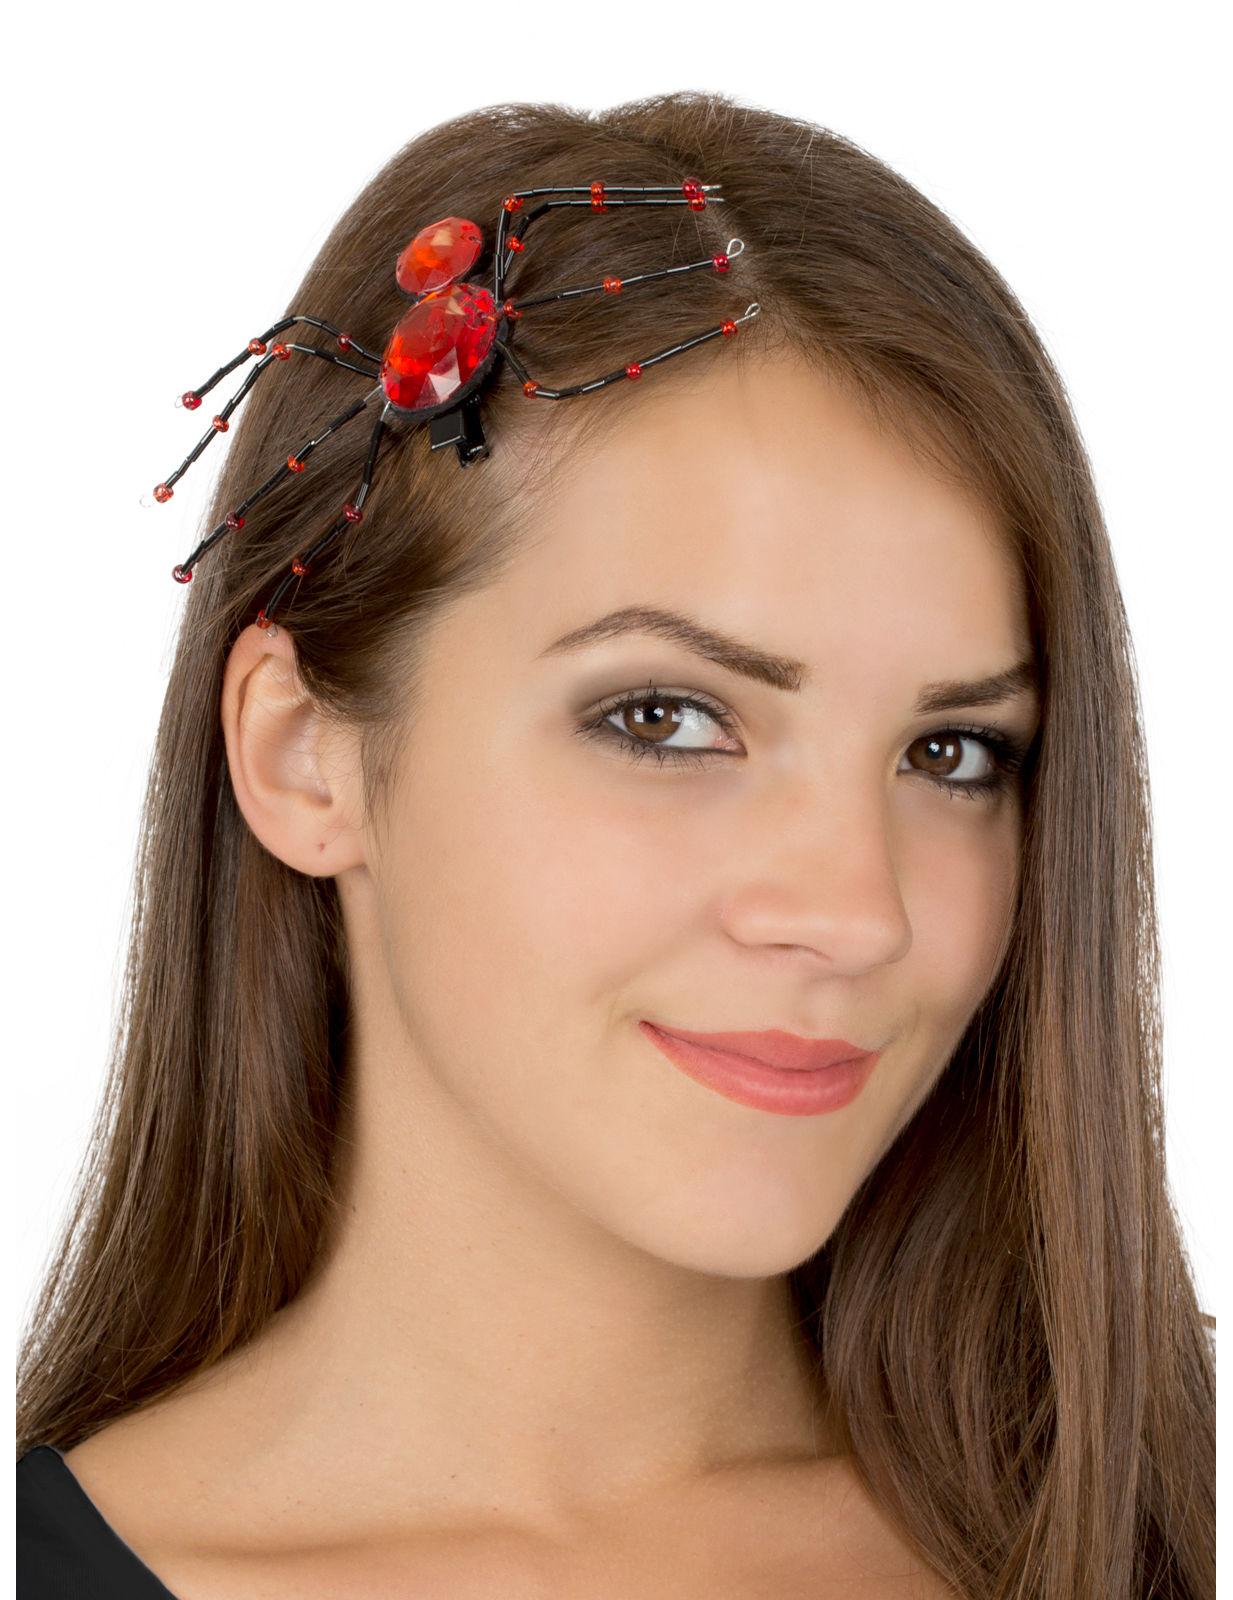 Edle spinnen haarspange schwarz rot accessoires und for Edle accessoires